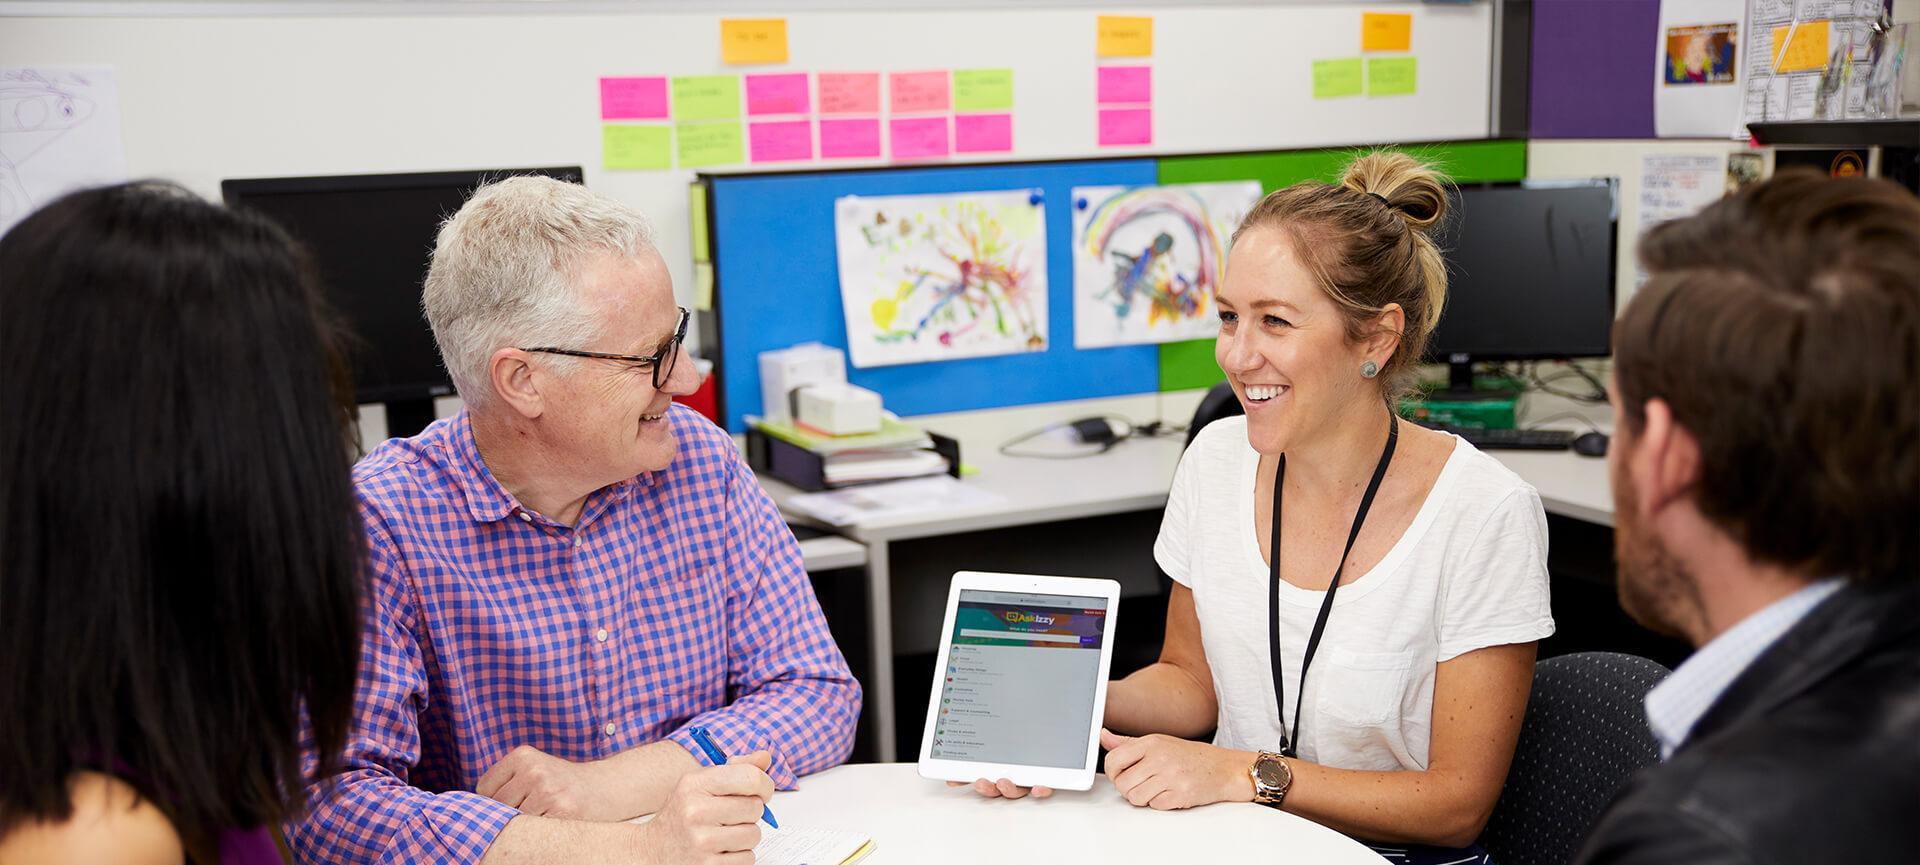 Infoxchange staff sitting around a table